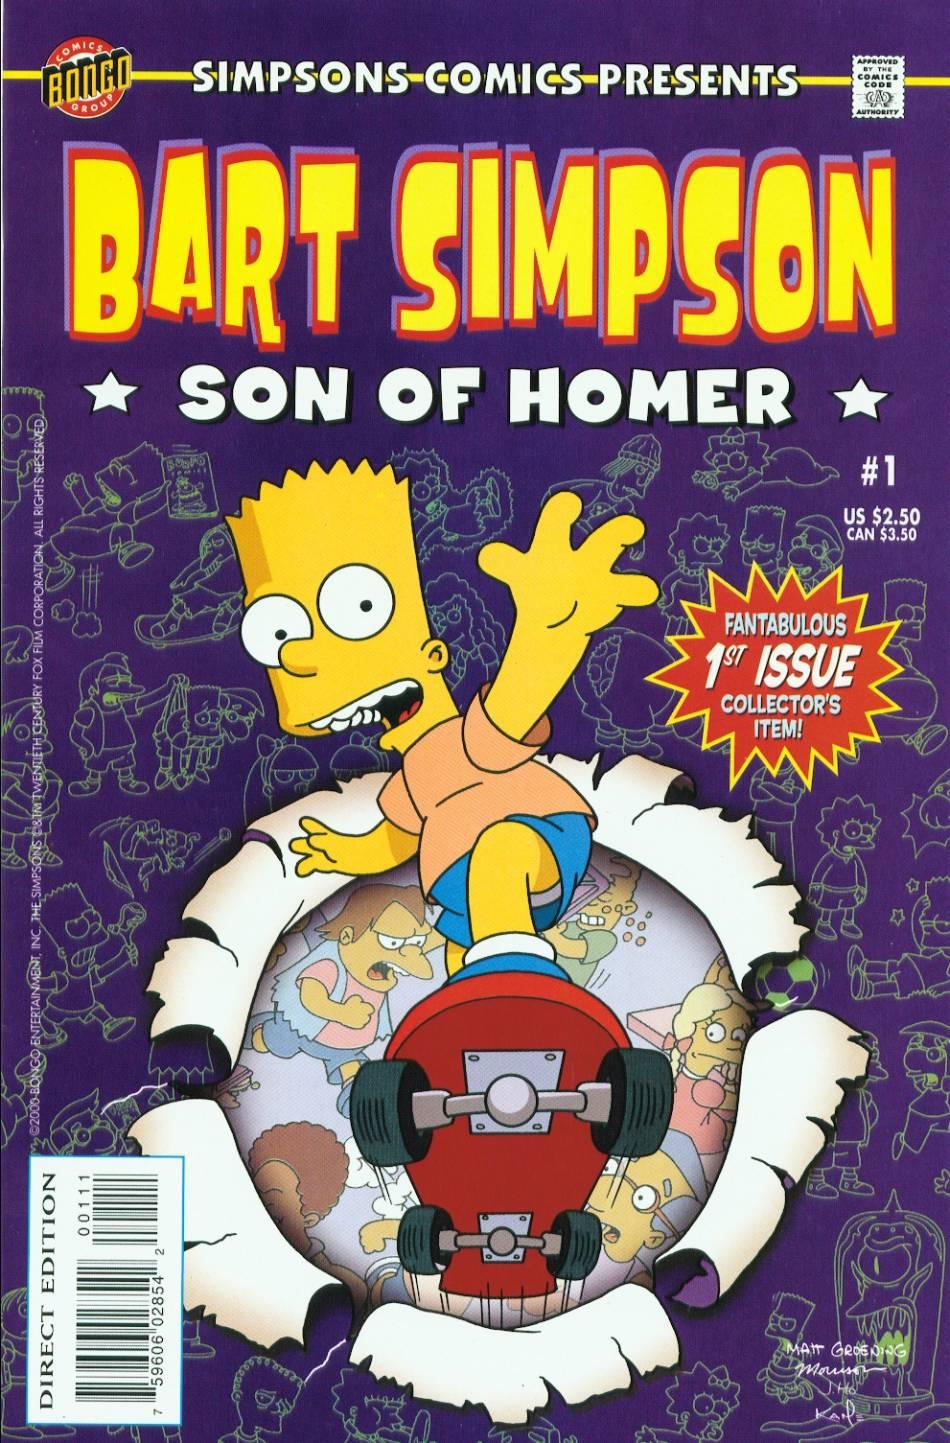 Simpsons Comics Presents Bart Simpson 1 Page 1